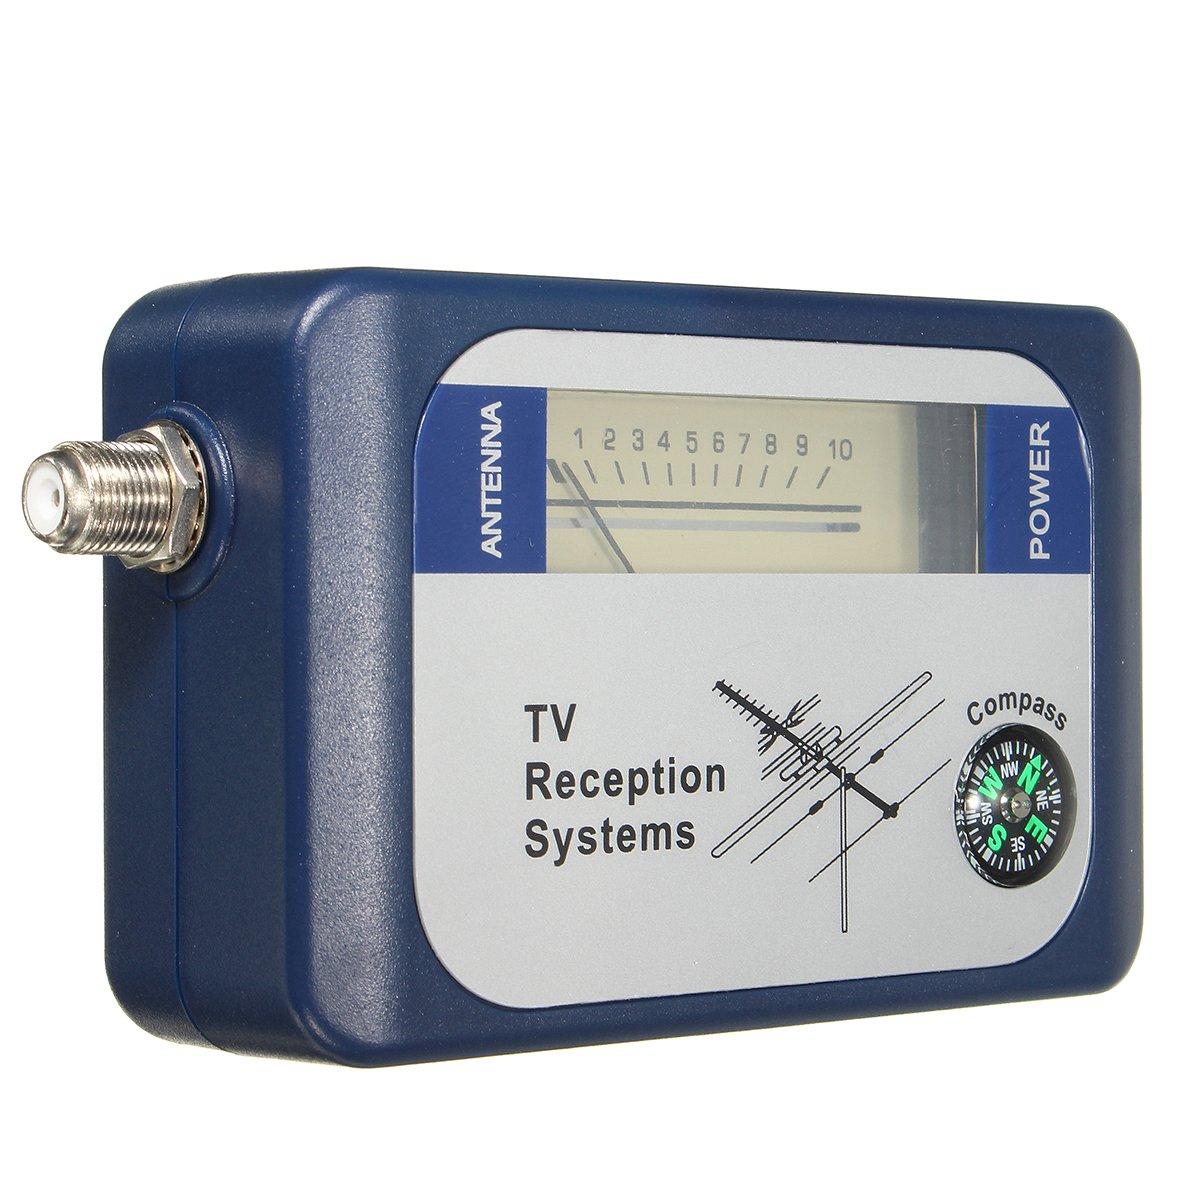 SF95DT DVB-T Finder Digital Aerial Terrestrial TV Antenna Signal Strength Meter Compass